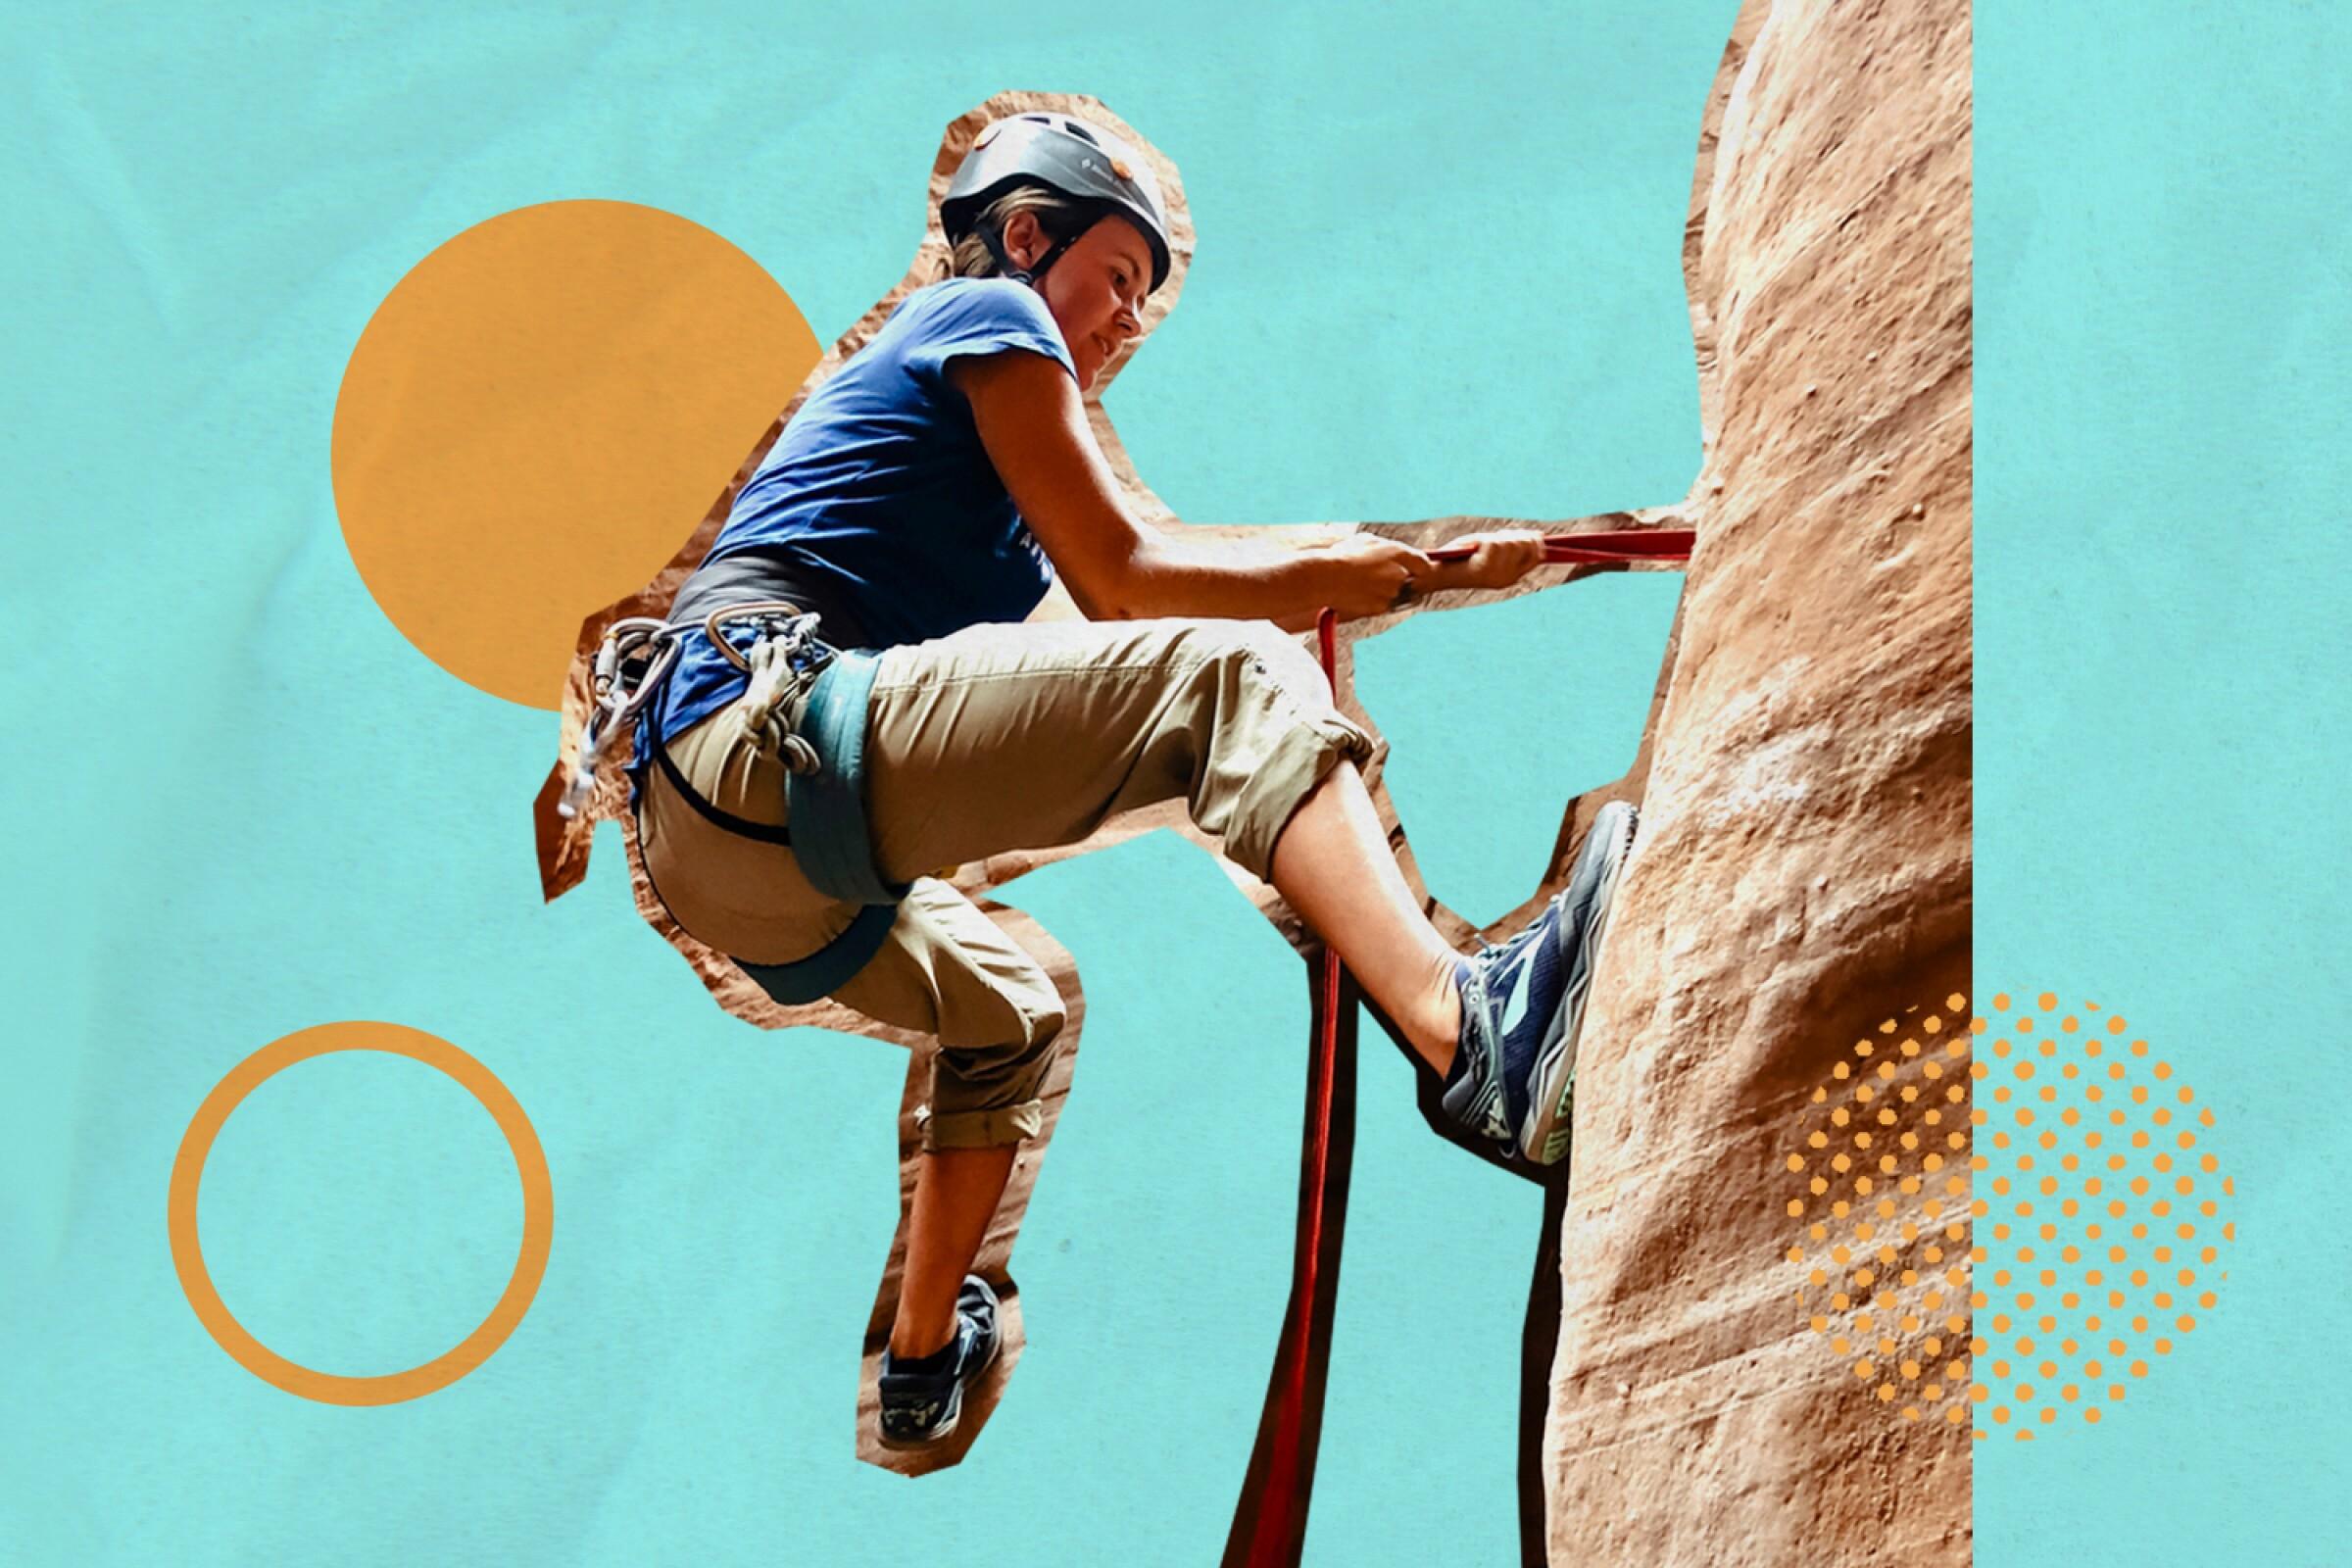 A woman climbs a canyon wall